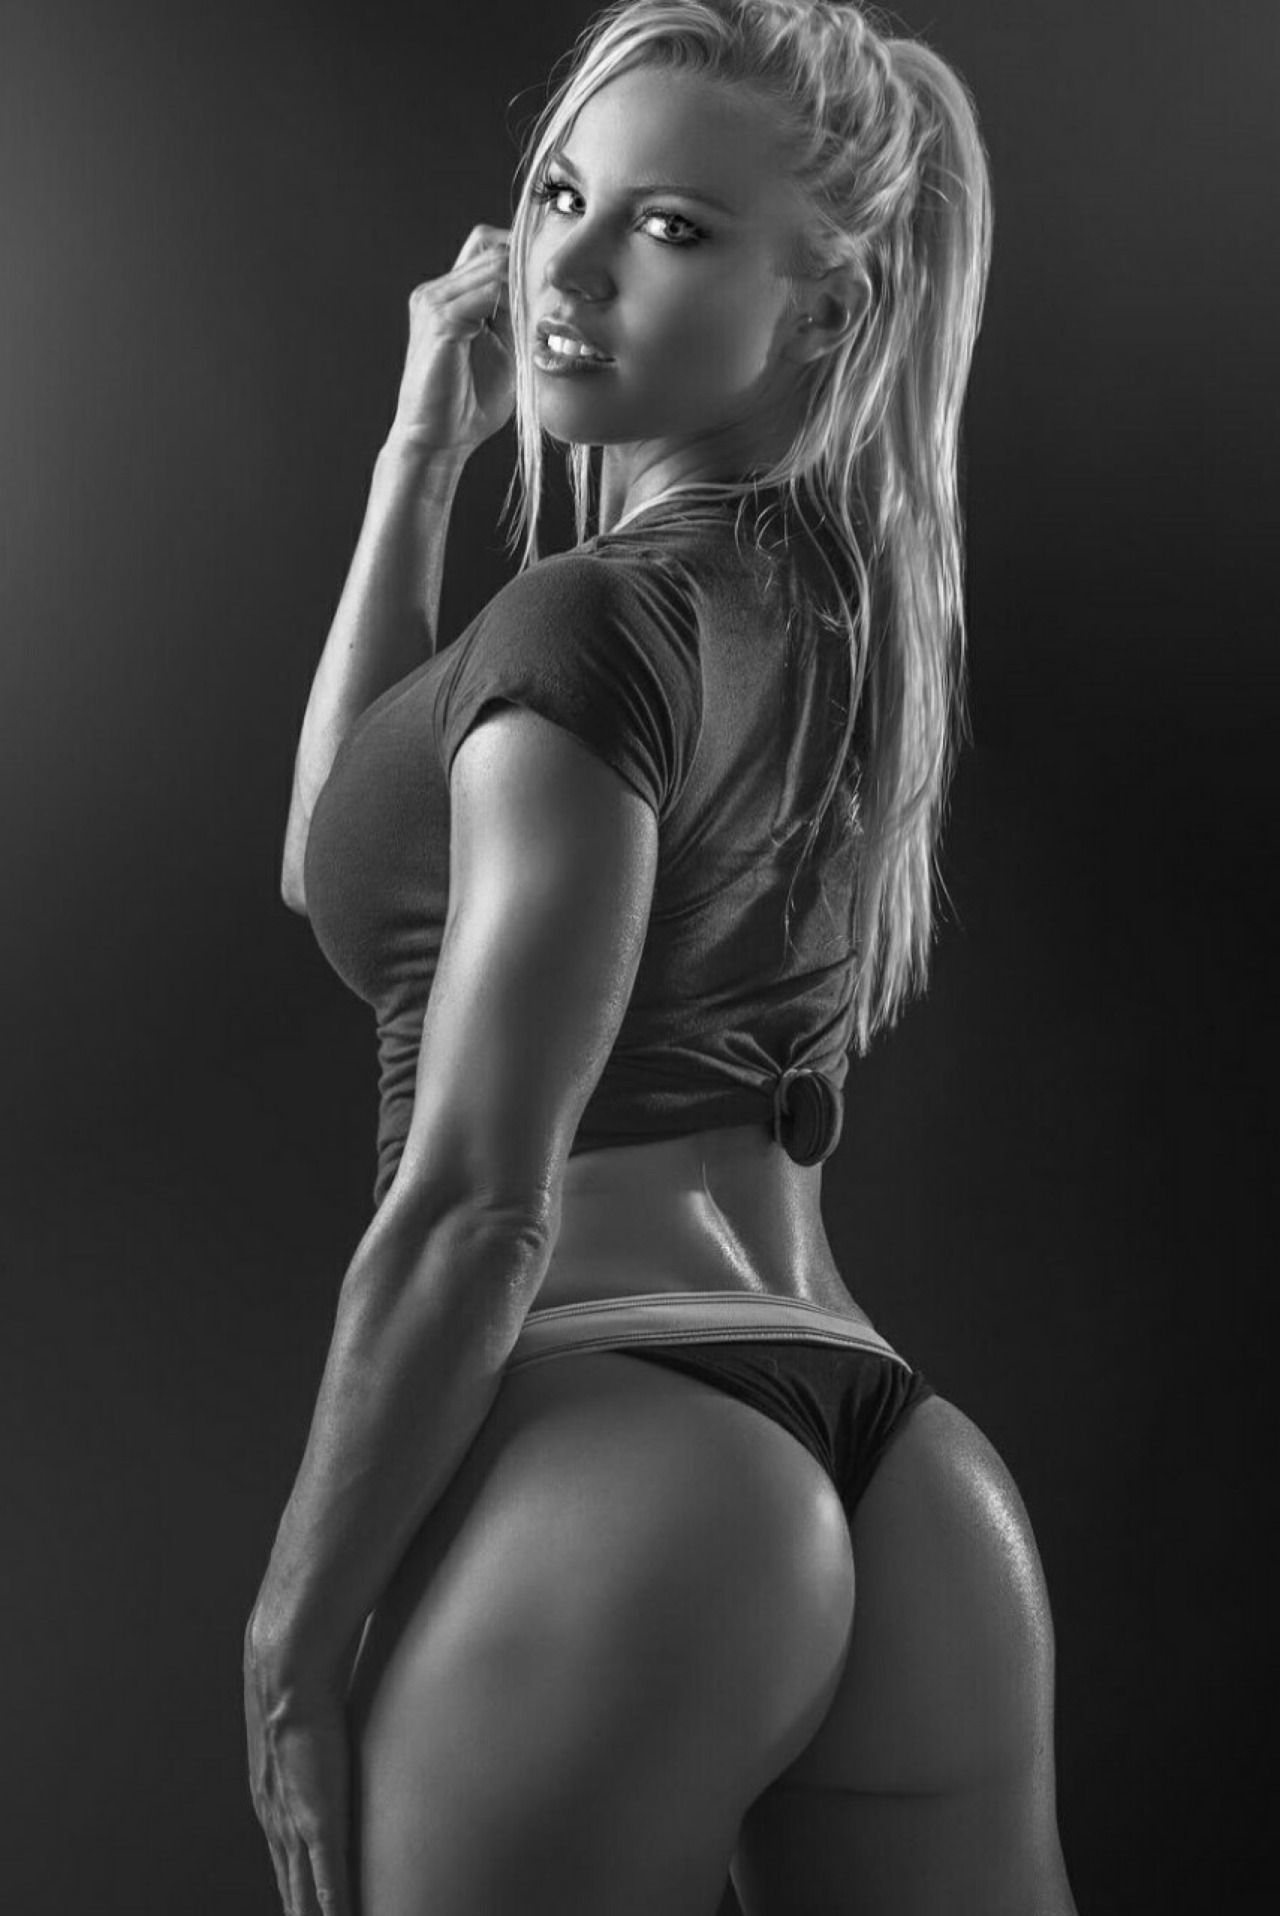 Beautiful Women to Adore | Sexxxy | Pinterest | Poses humanas ...